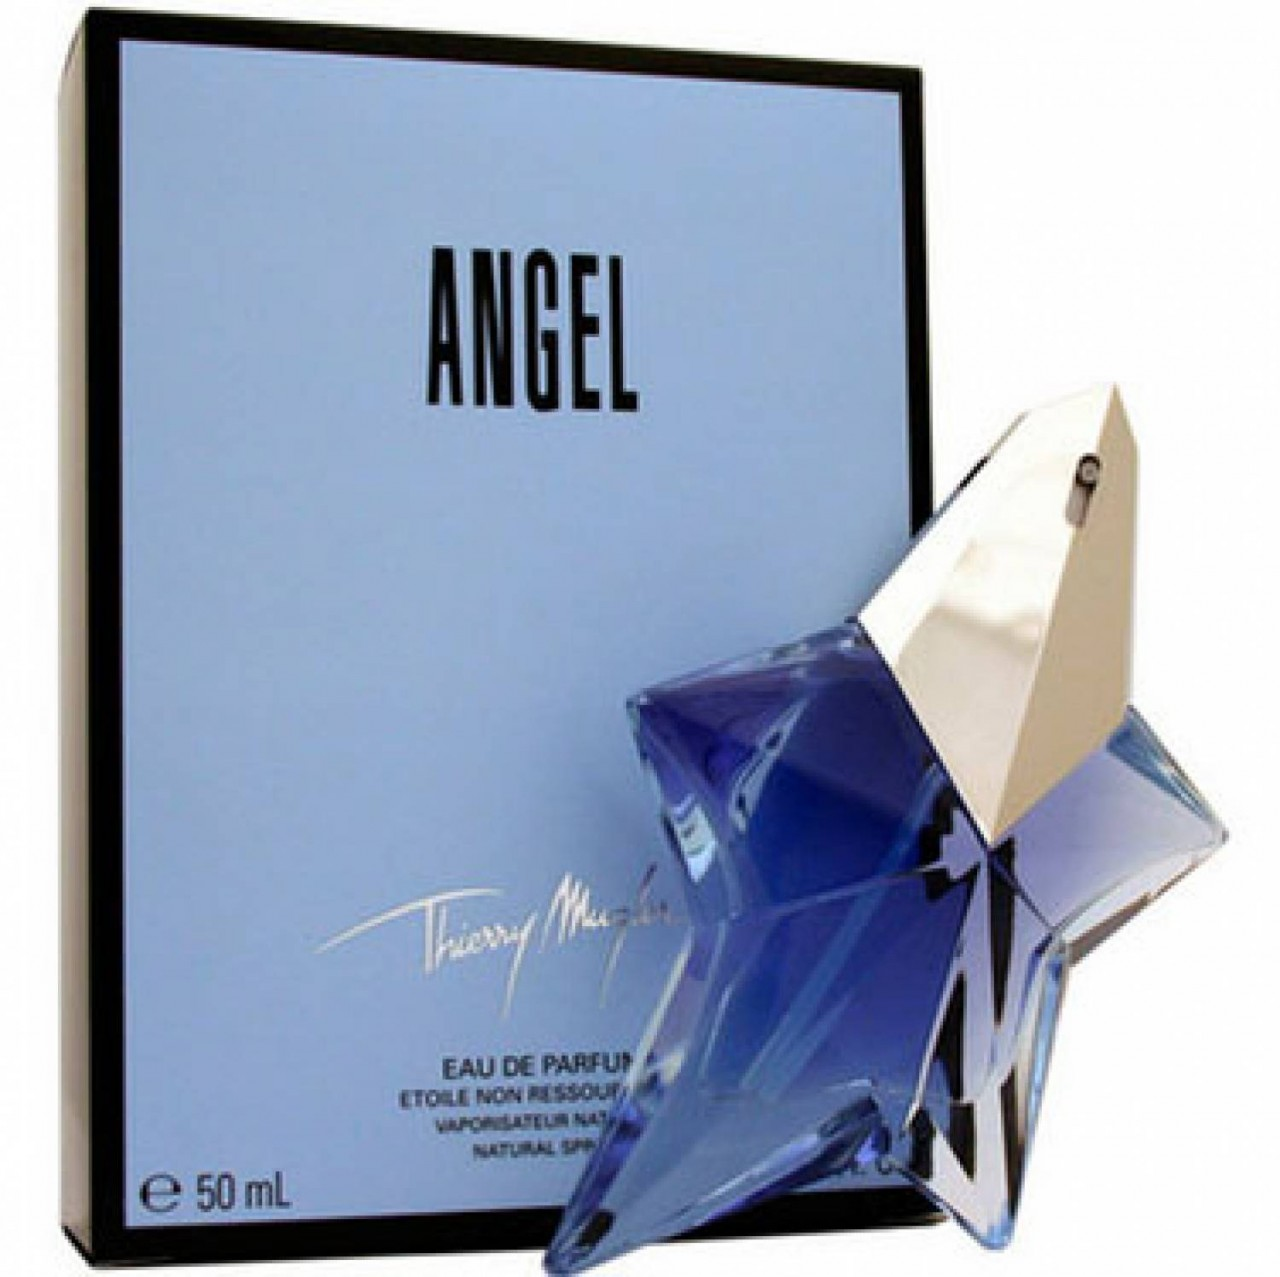 thierry mugler angel 50ml edp in pakistan homeshopping. Black Bedroom Furniture Sets. Home Design Ideas